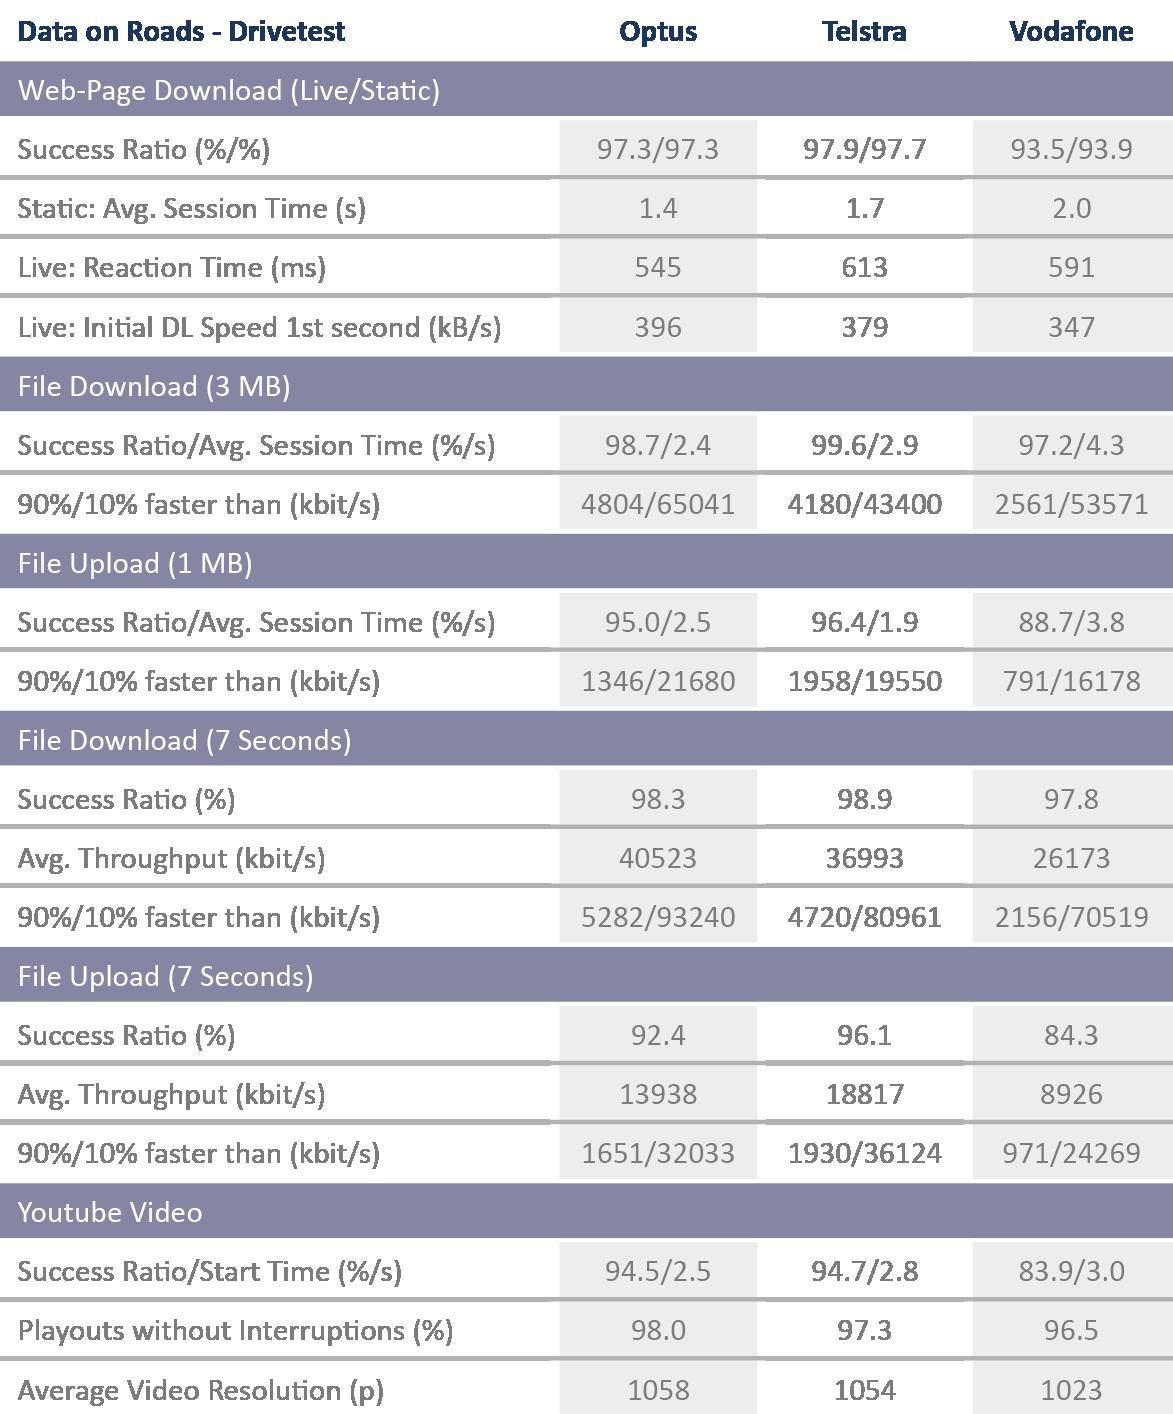 AUS_Tabelle_DataRoads2017.png